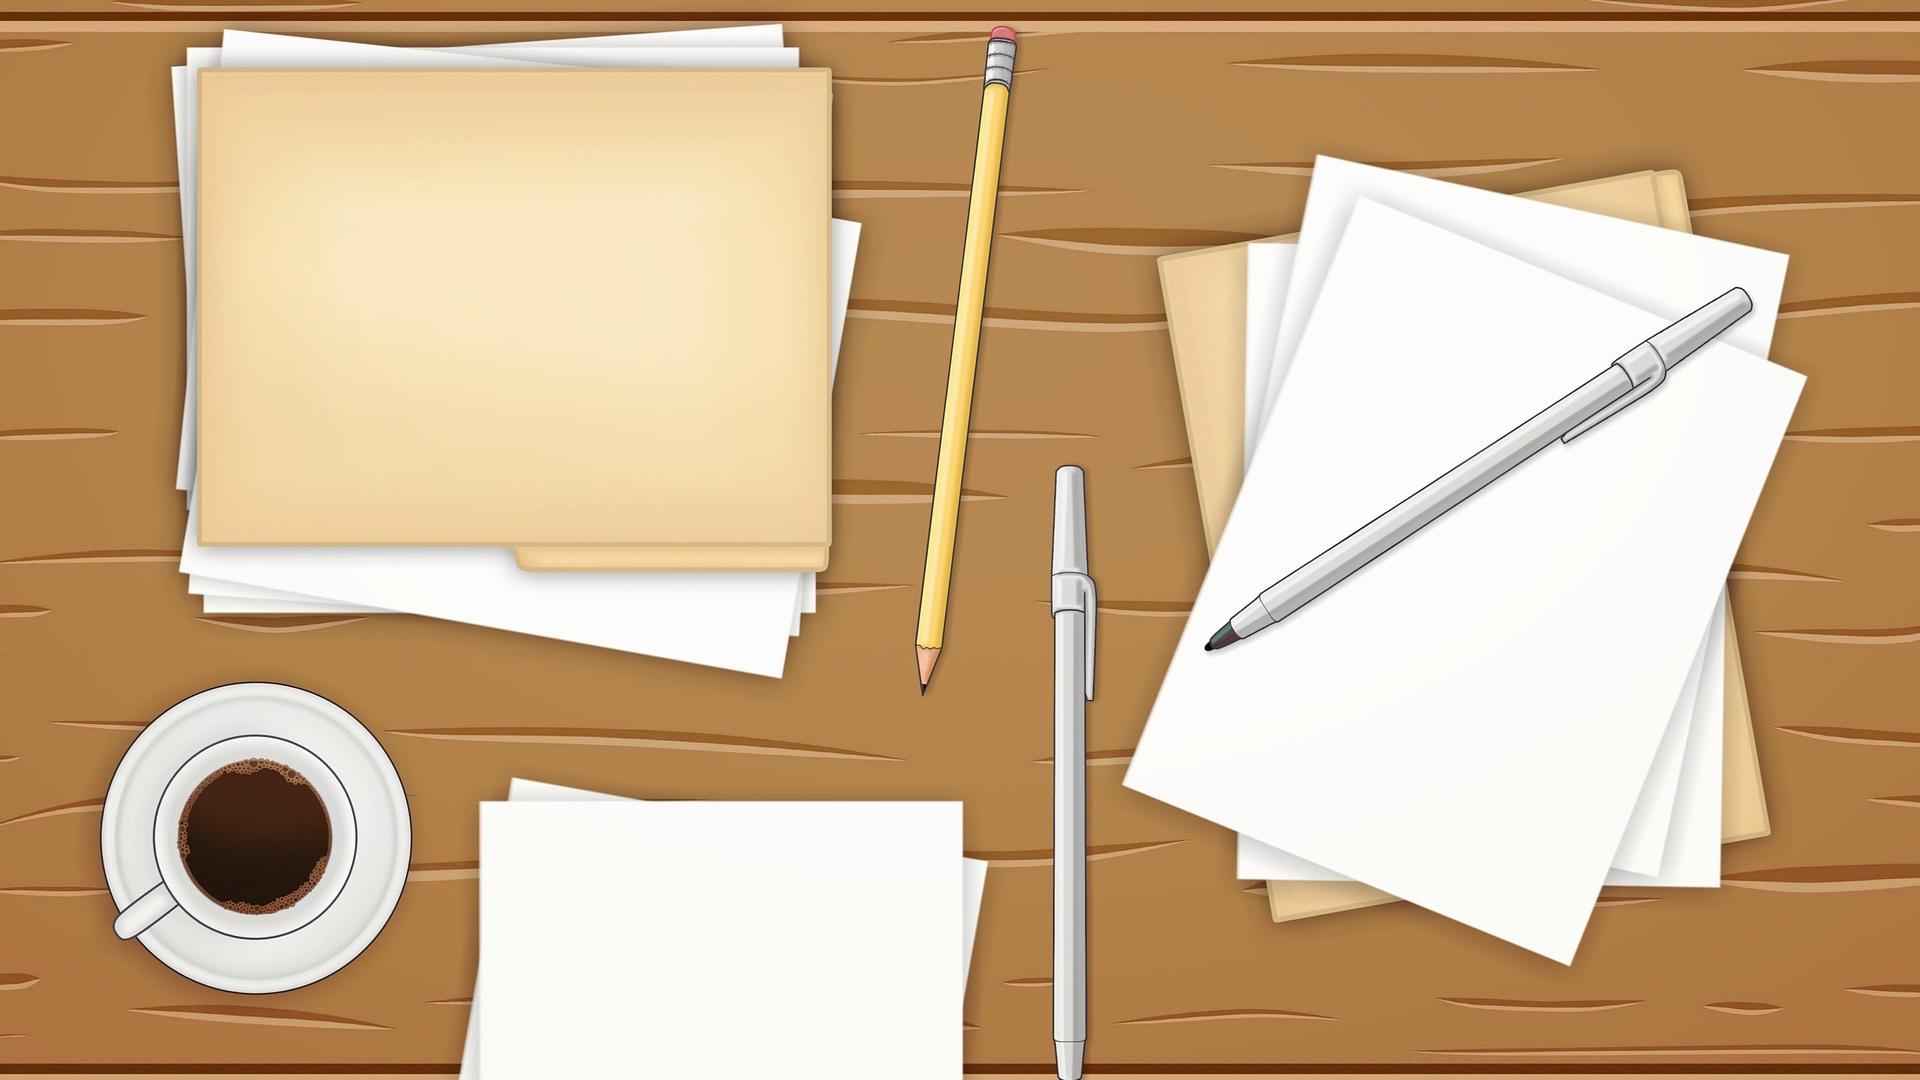 1Day企画♪「夏休みに一緒に書類整理しませんか?」